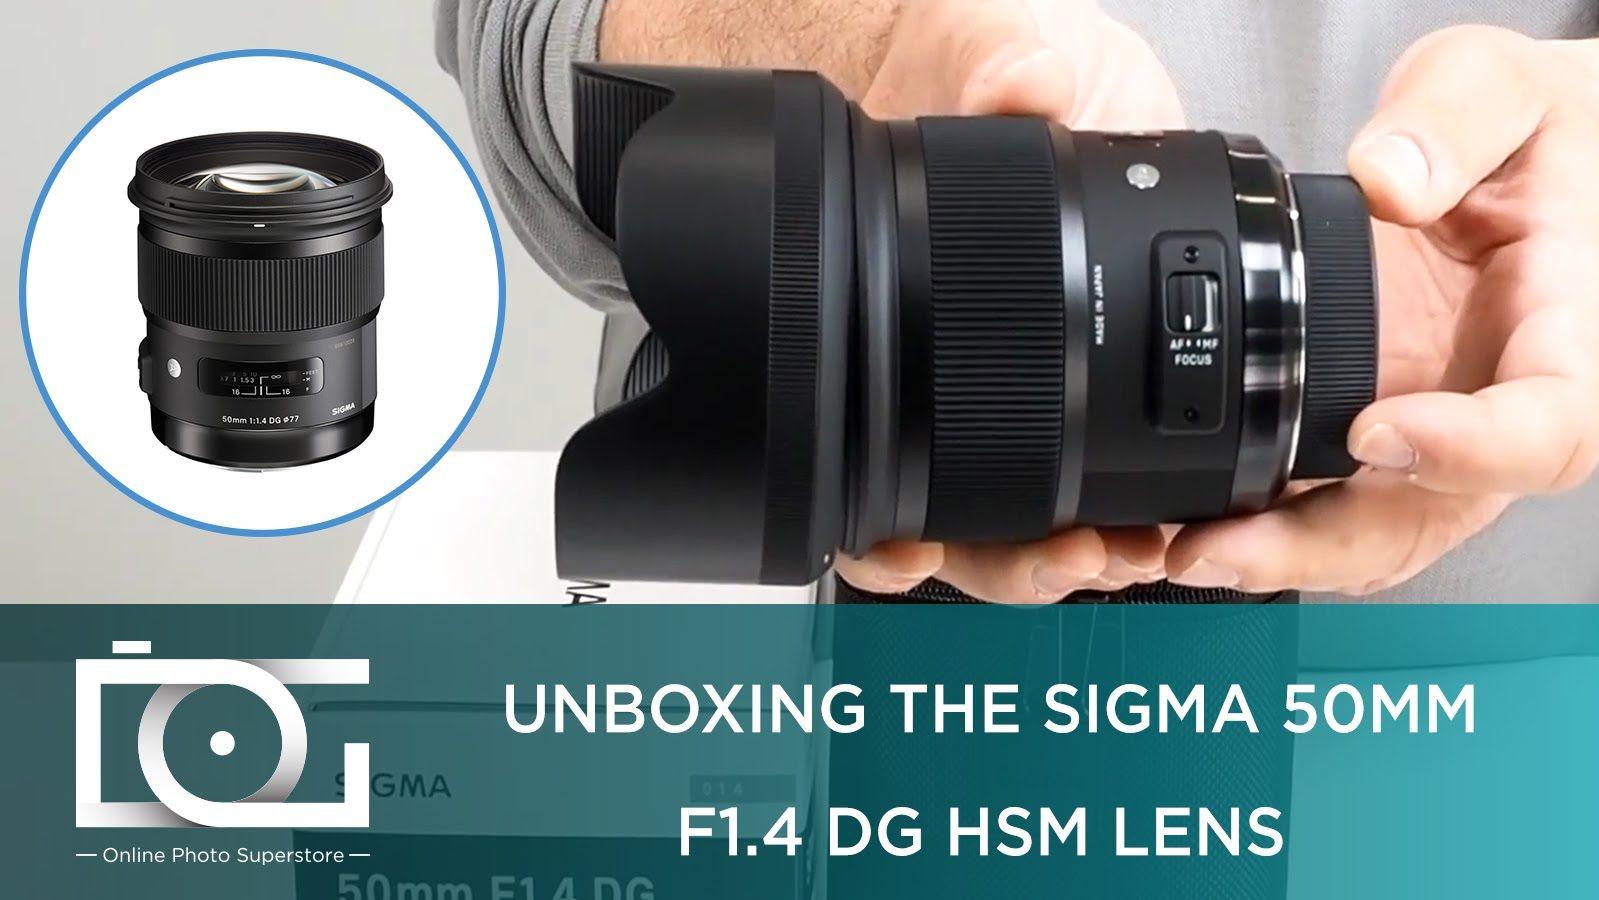 Unboxing The Sigma 50mm F 1 4 Dg Hsm Lens For Nikon Canon And Sony Dslr Cameras Sony Dslr Camera Dslr Dslr Camera